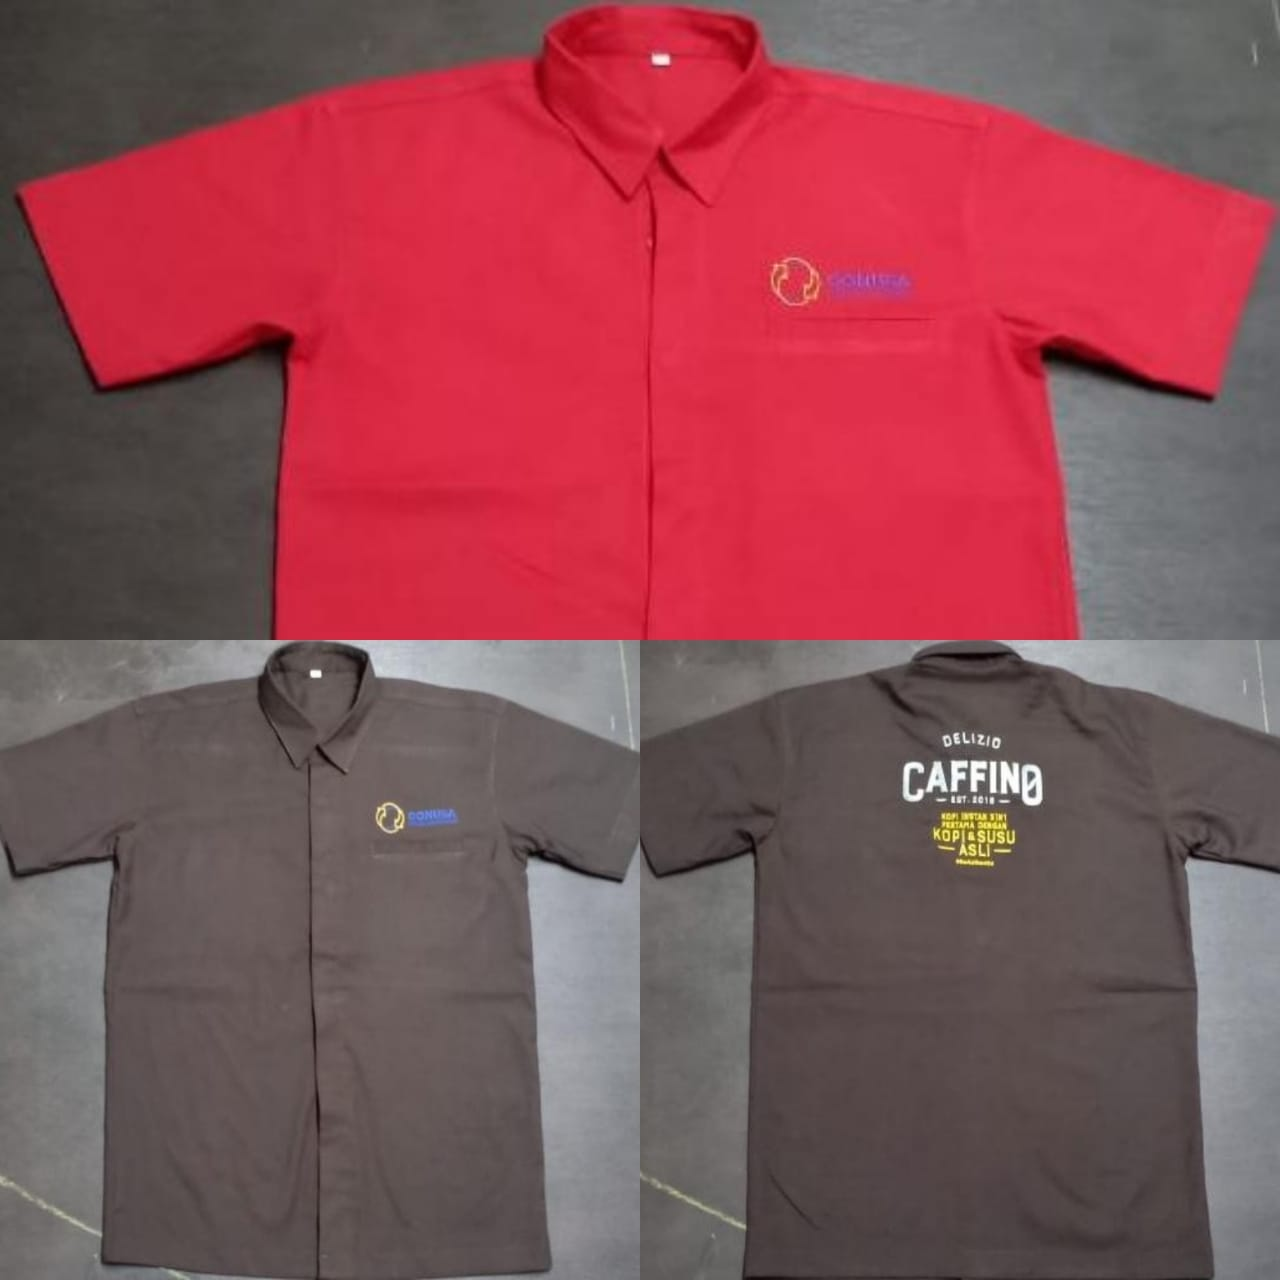 Bikin Seragam Perusahaan Bordir Logo